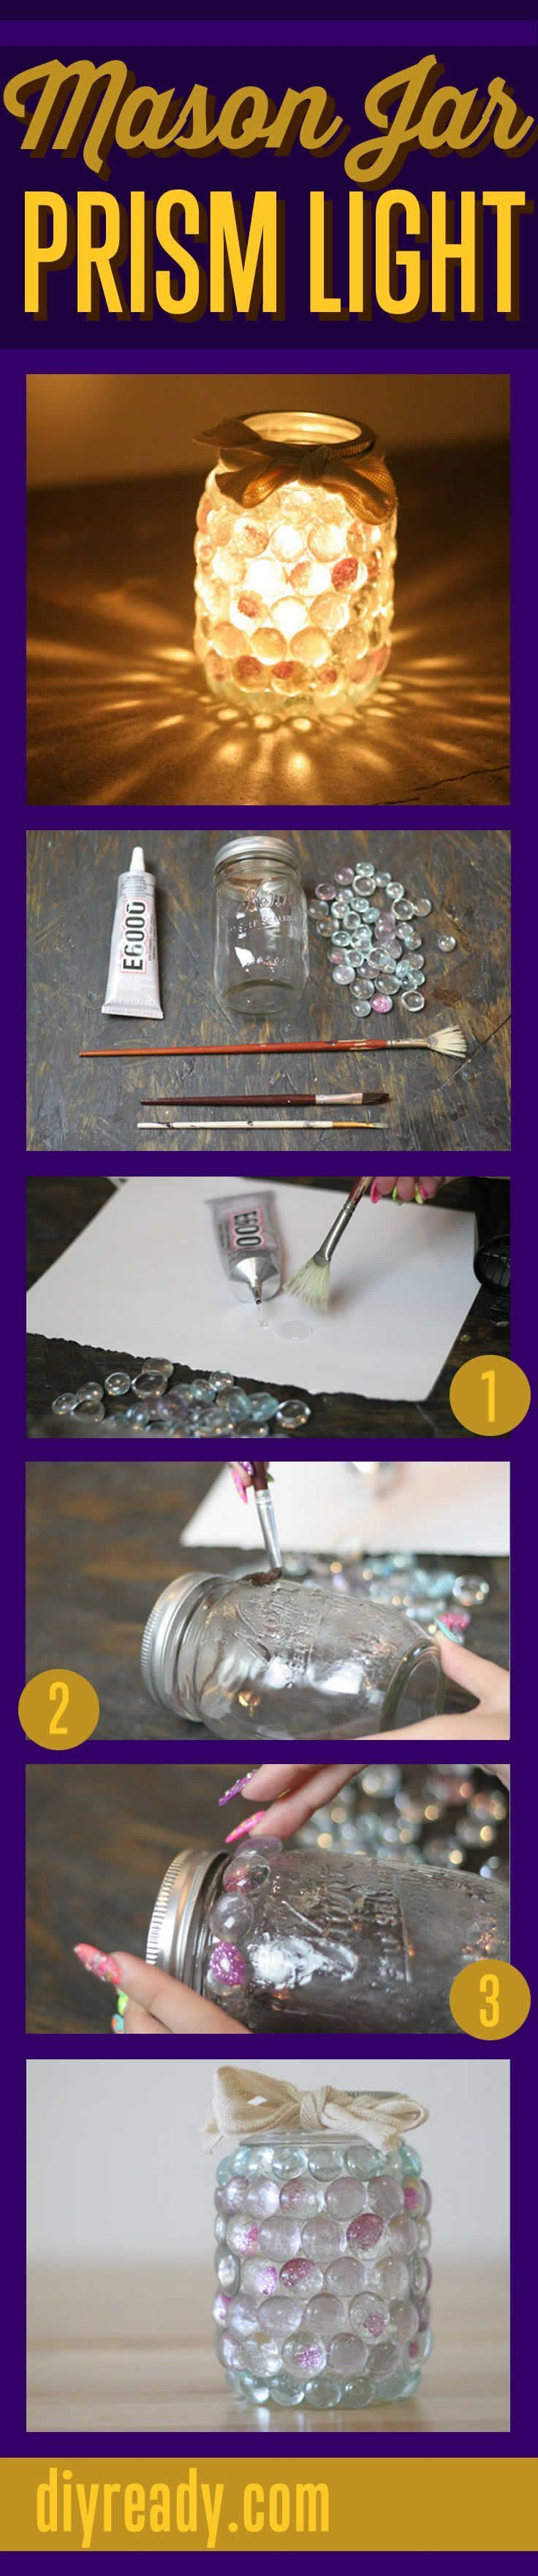 Mason Jar Crafts - This Mason Jar DIY Prism Light is made from dollar store glass stones diyready.com #crafts #diy #masonjar